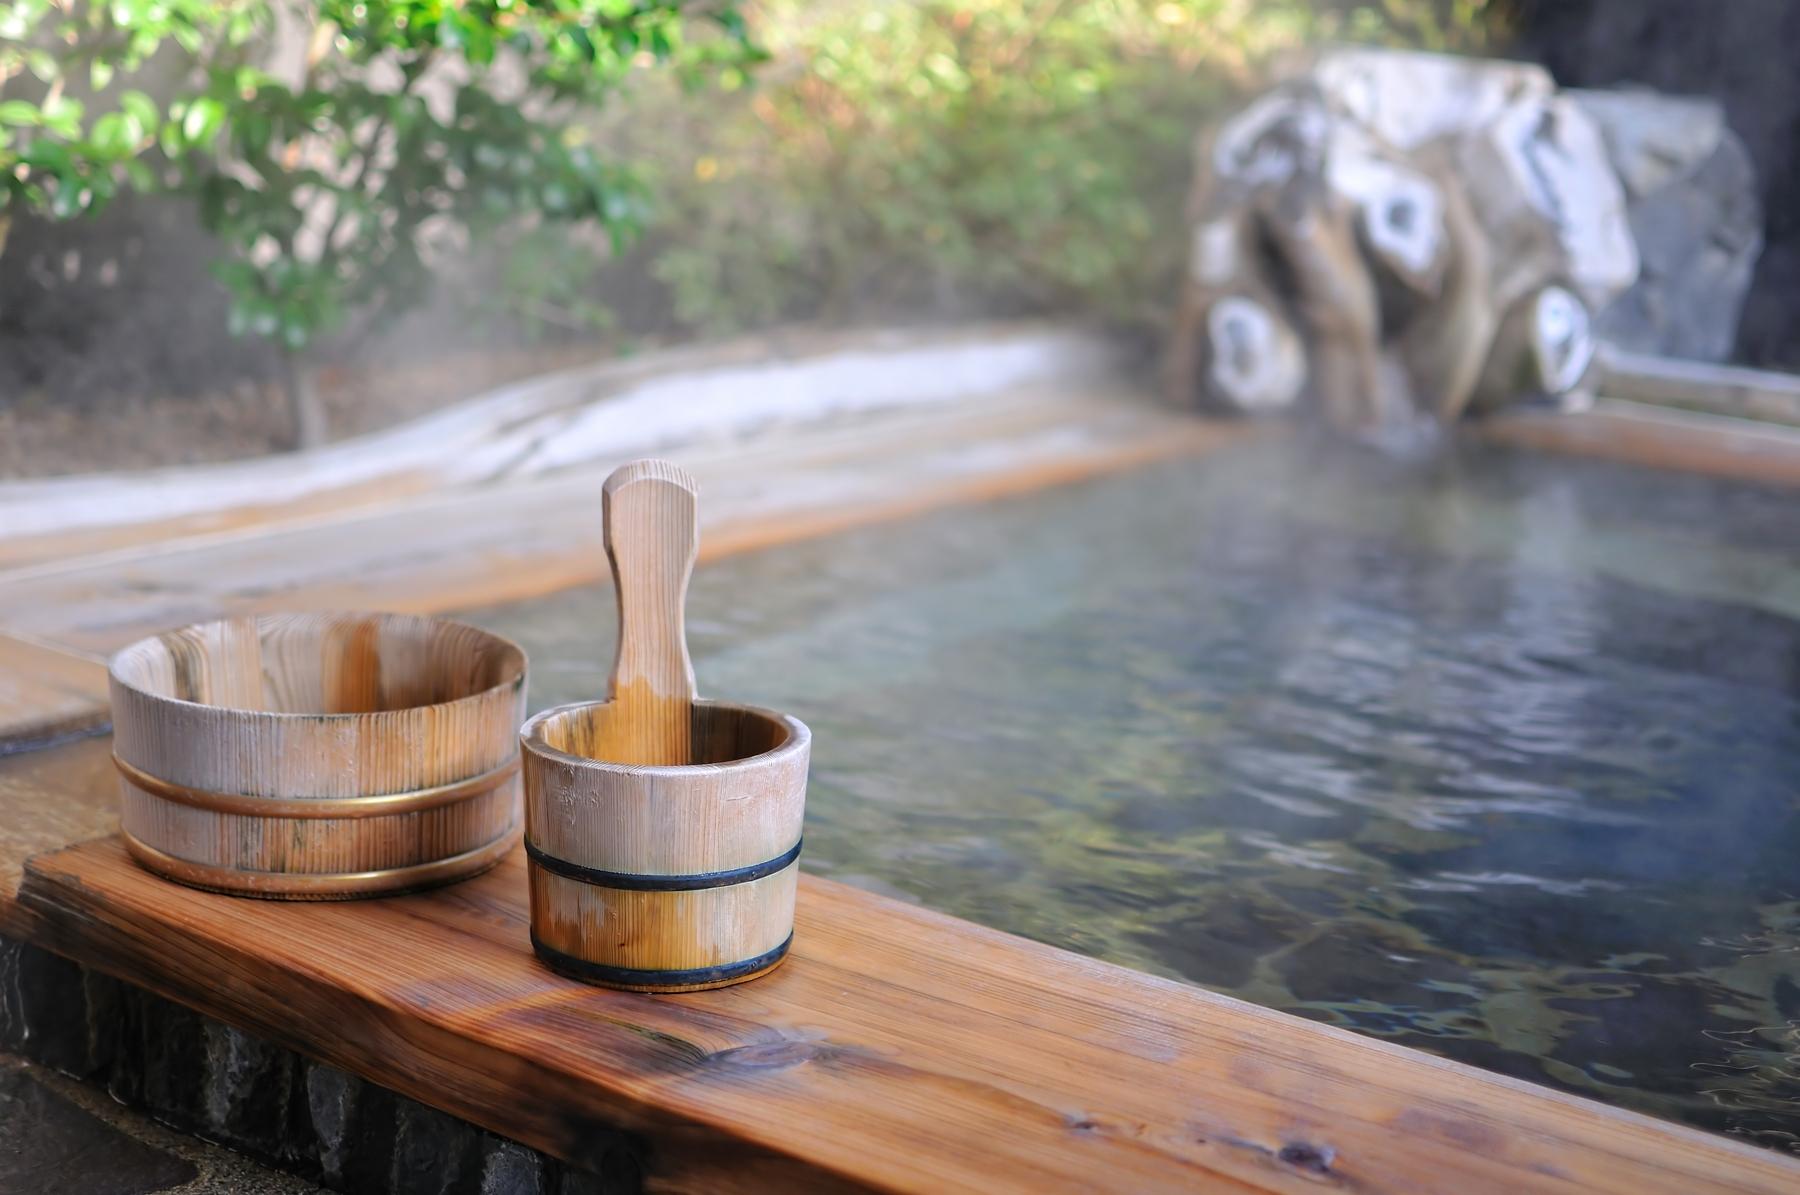 hot water pool and wooden bowls at a ryokan in Japan